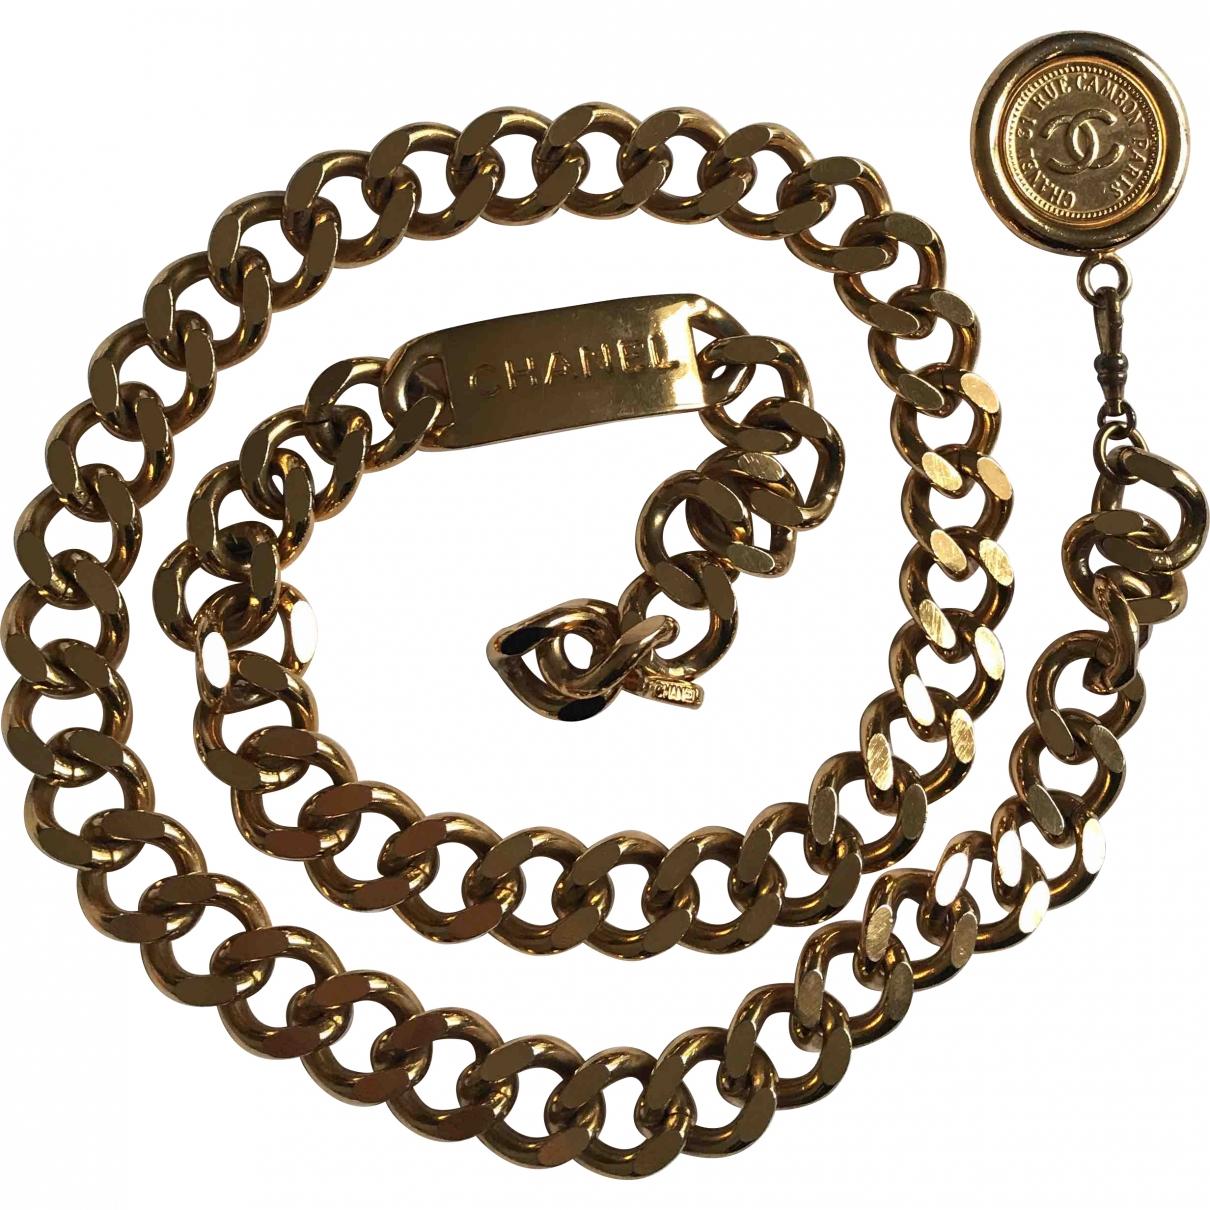 Chanel \N Gold Metal belt for Women 80 cm